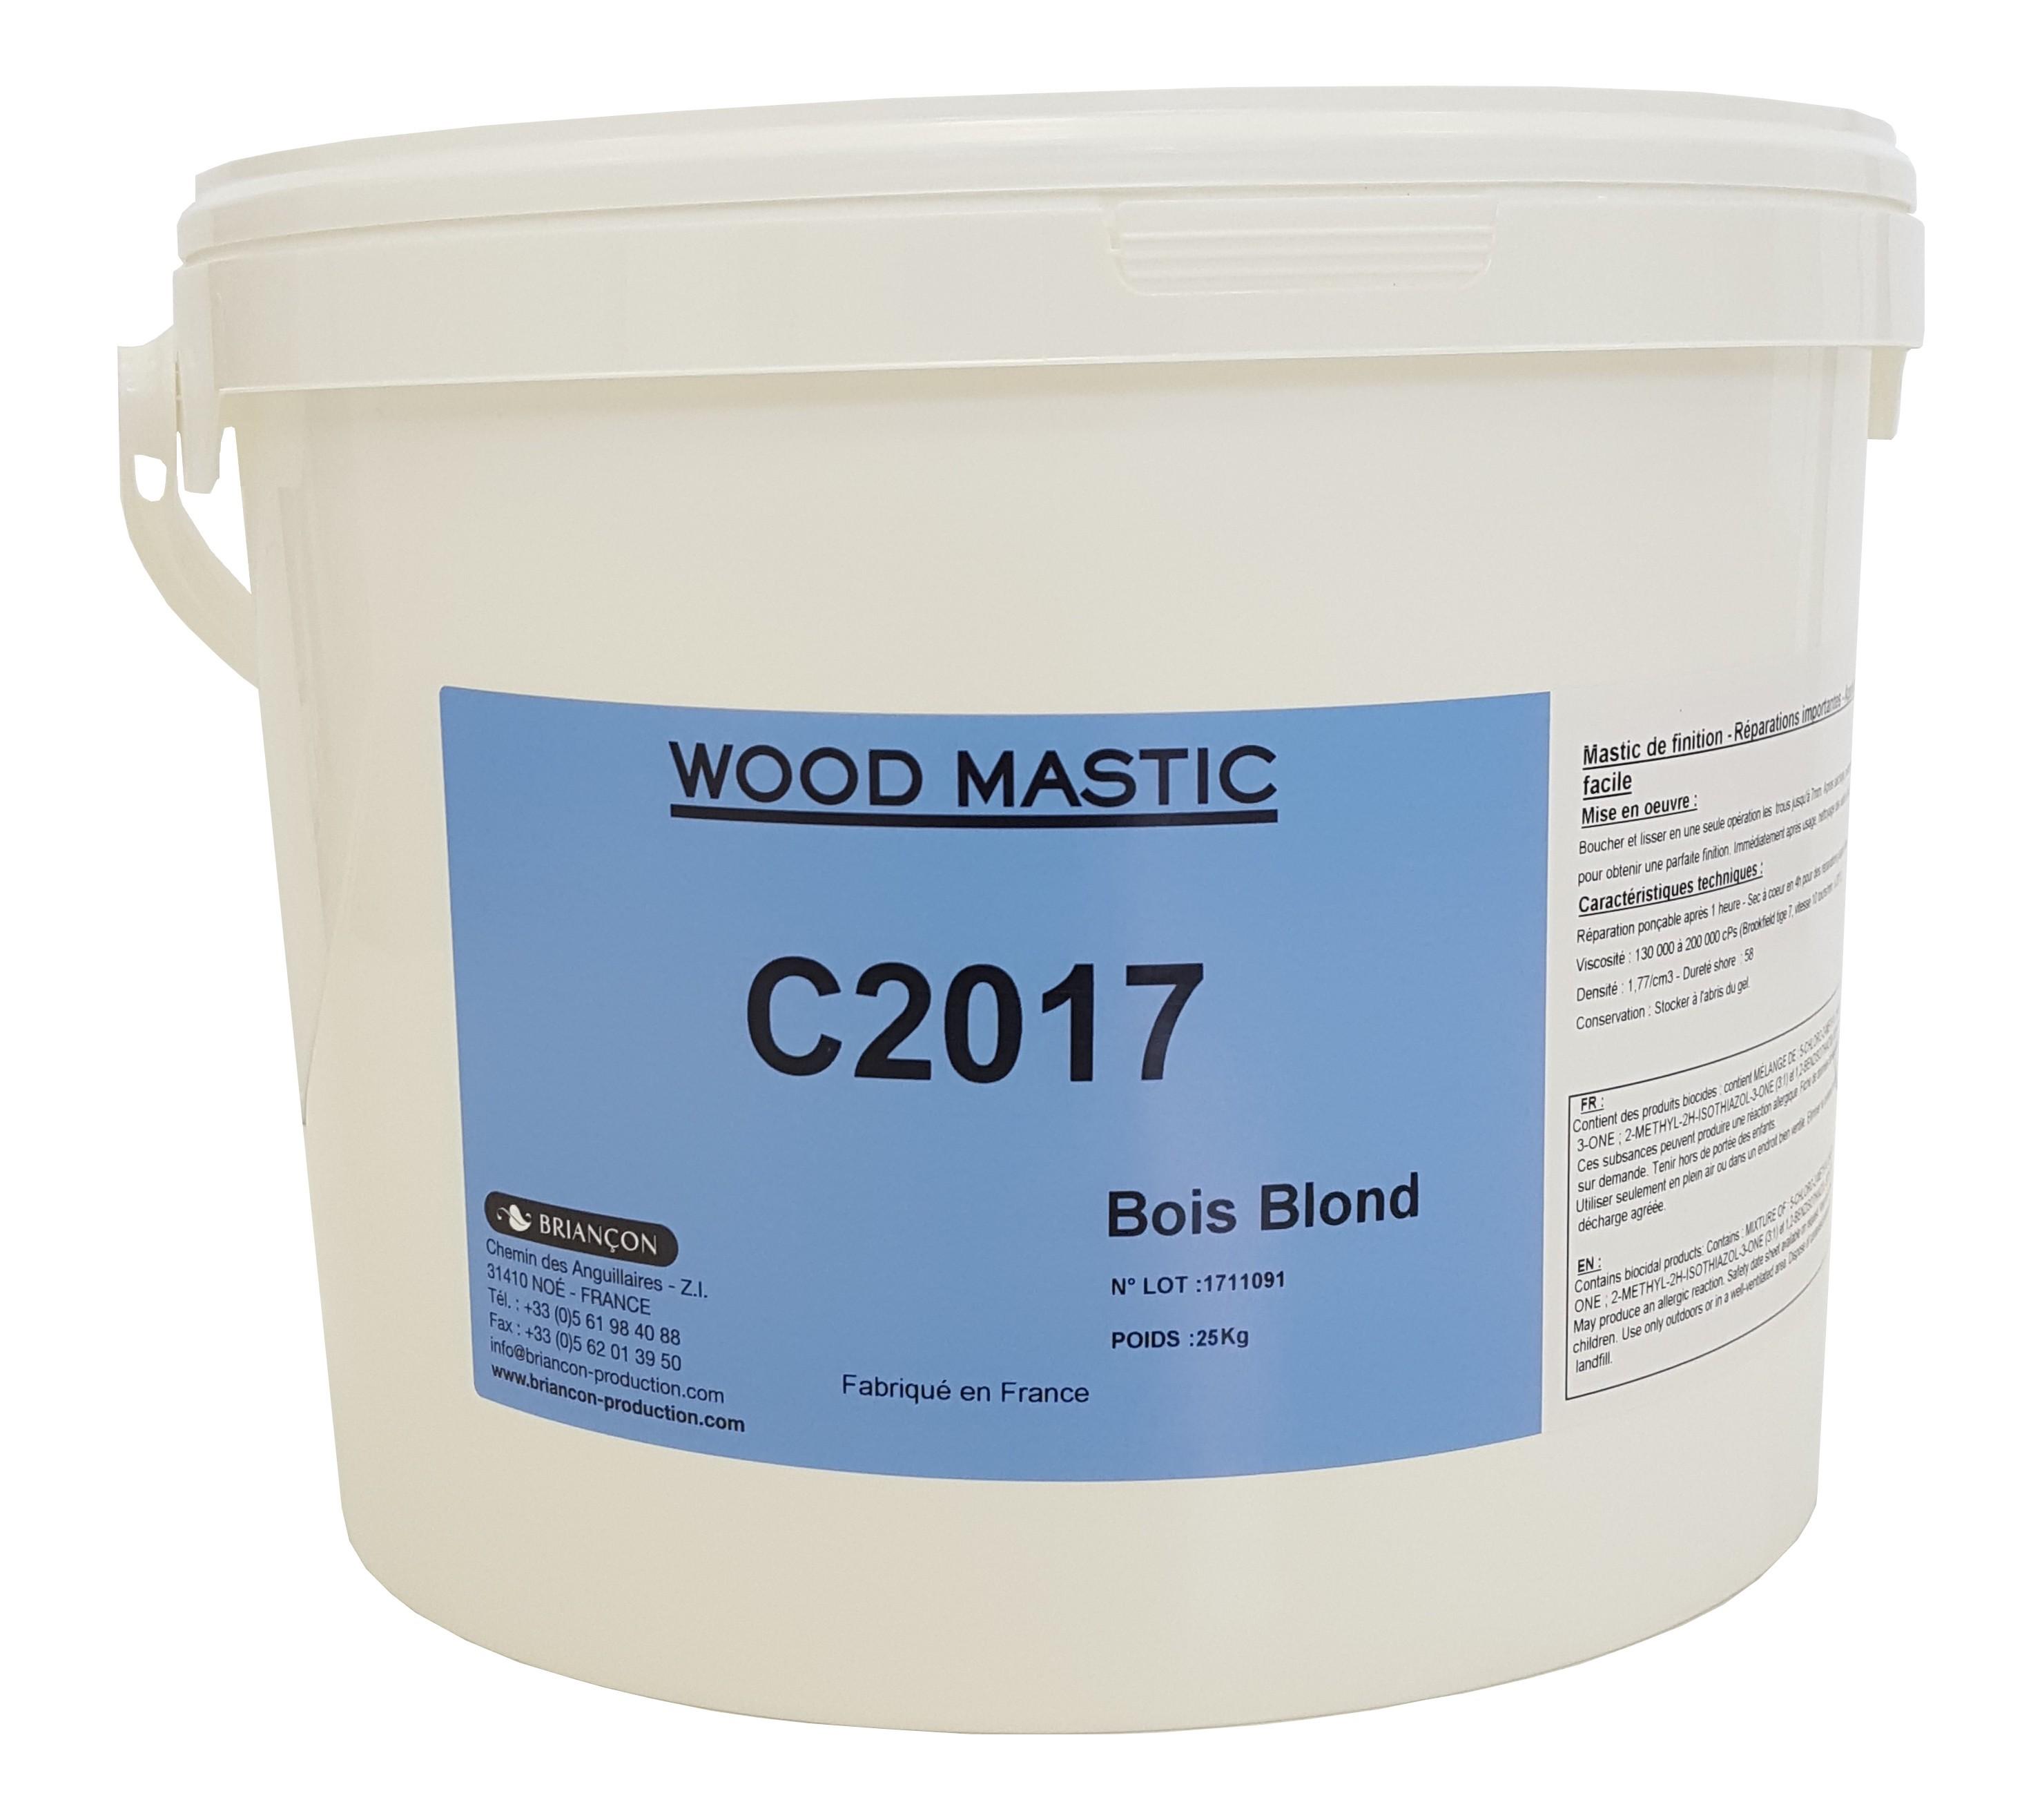 Wood Mastic C2017 - Mastic prêt à l'emploi - Briançon production